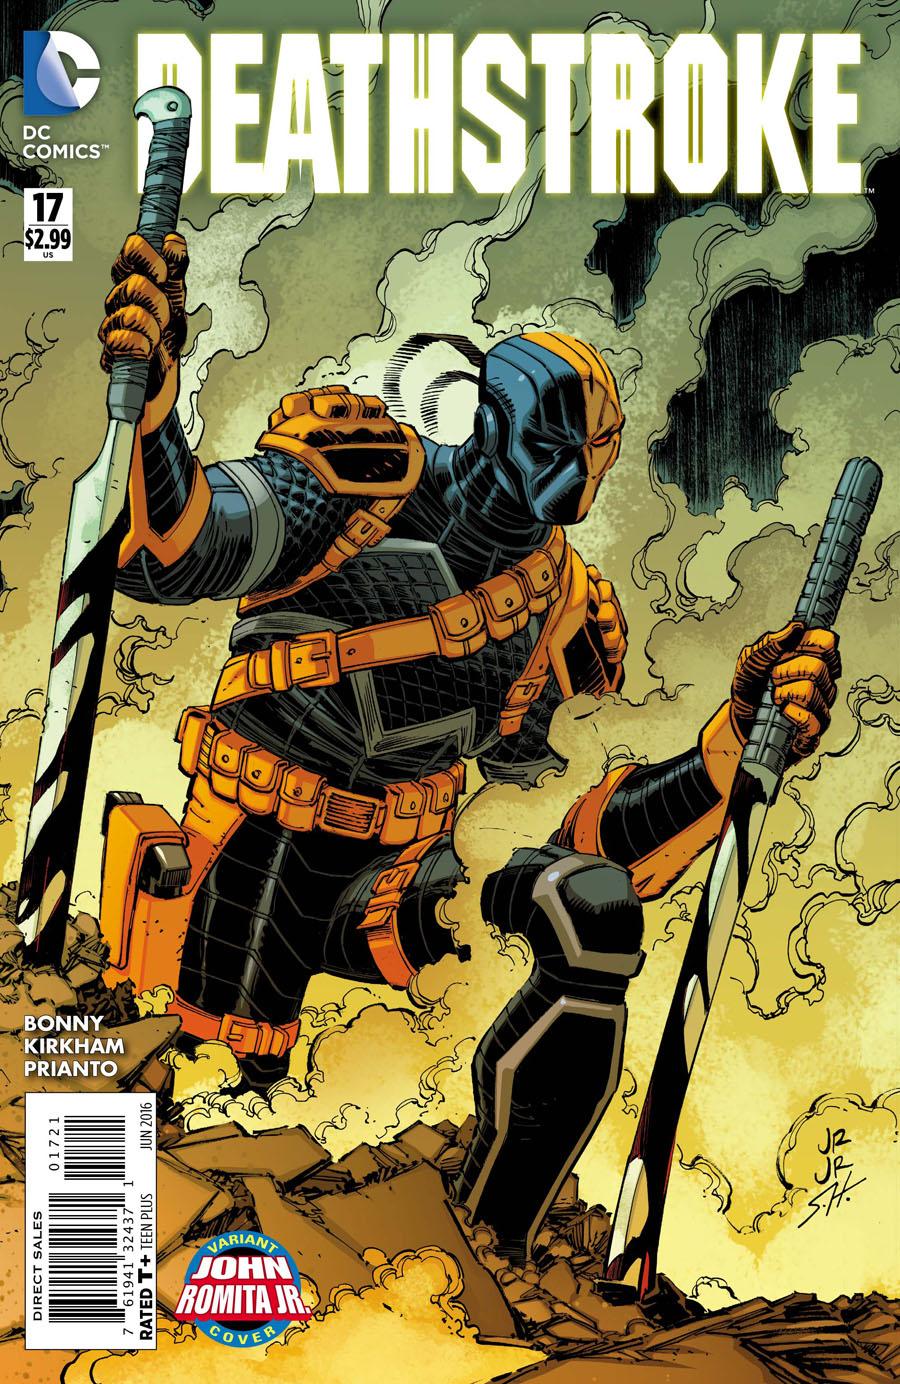 Deathstroke Vol 3 #17 Cover B Variant John Romita Jr Cover